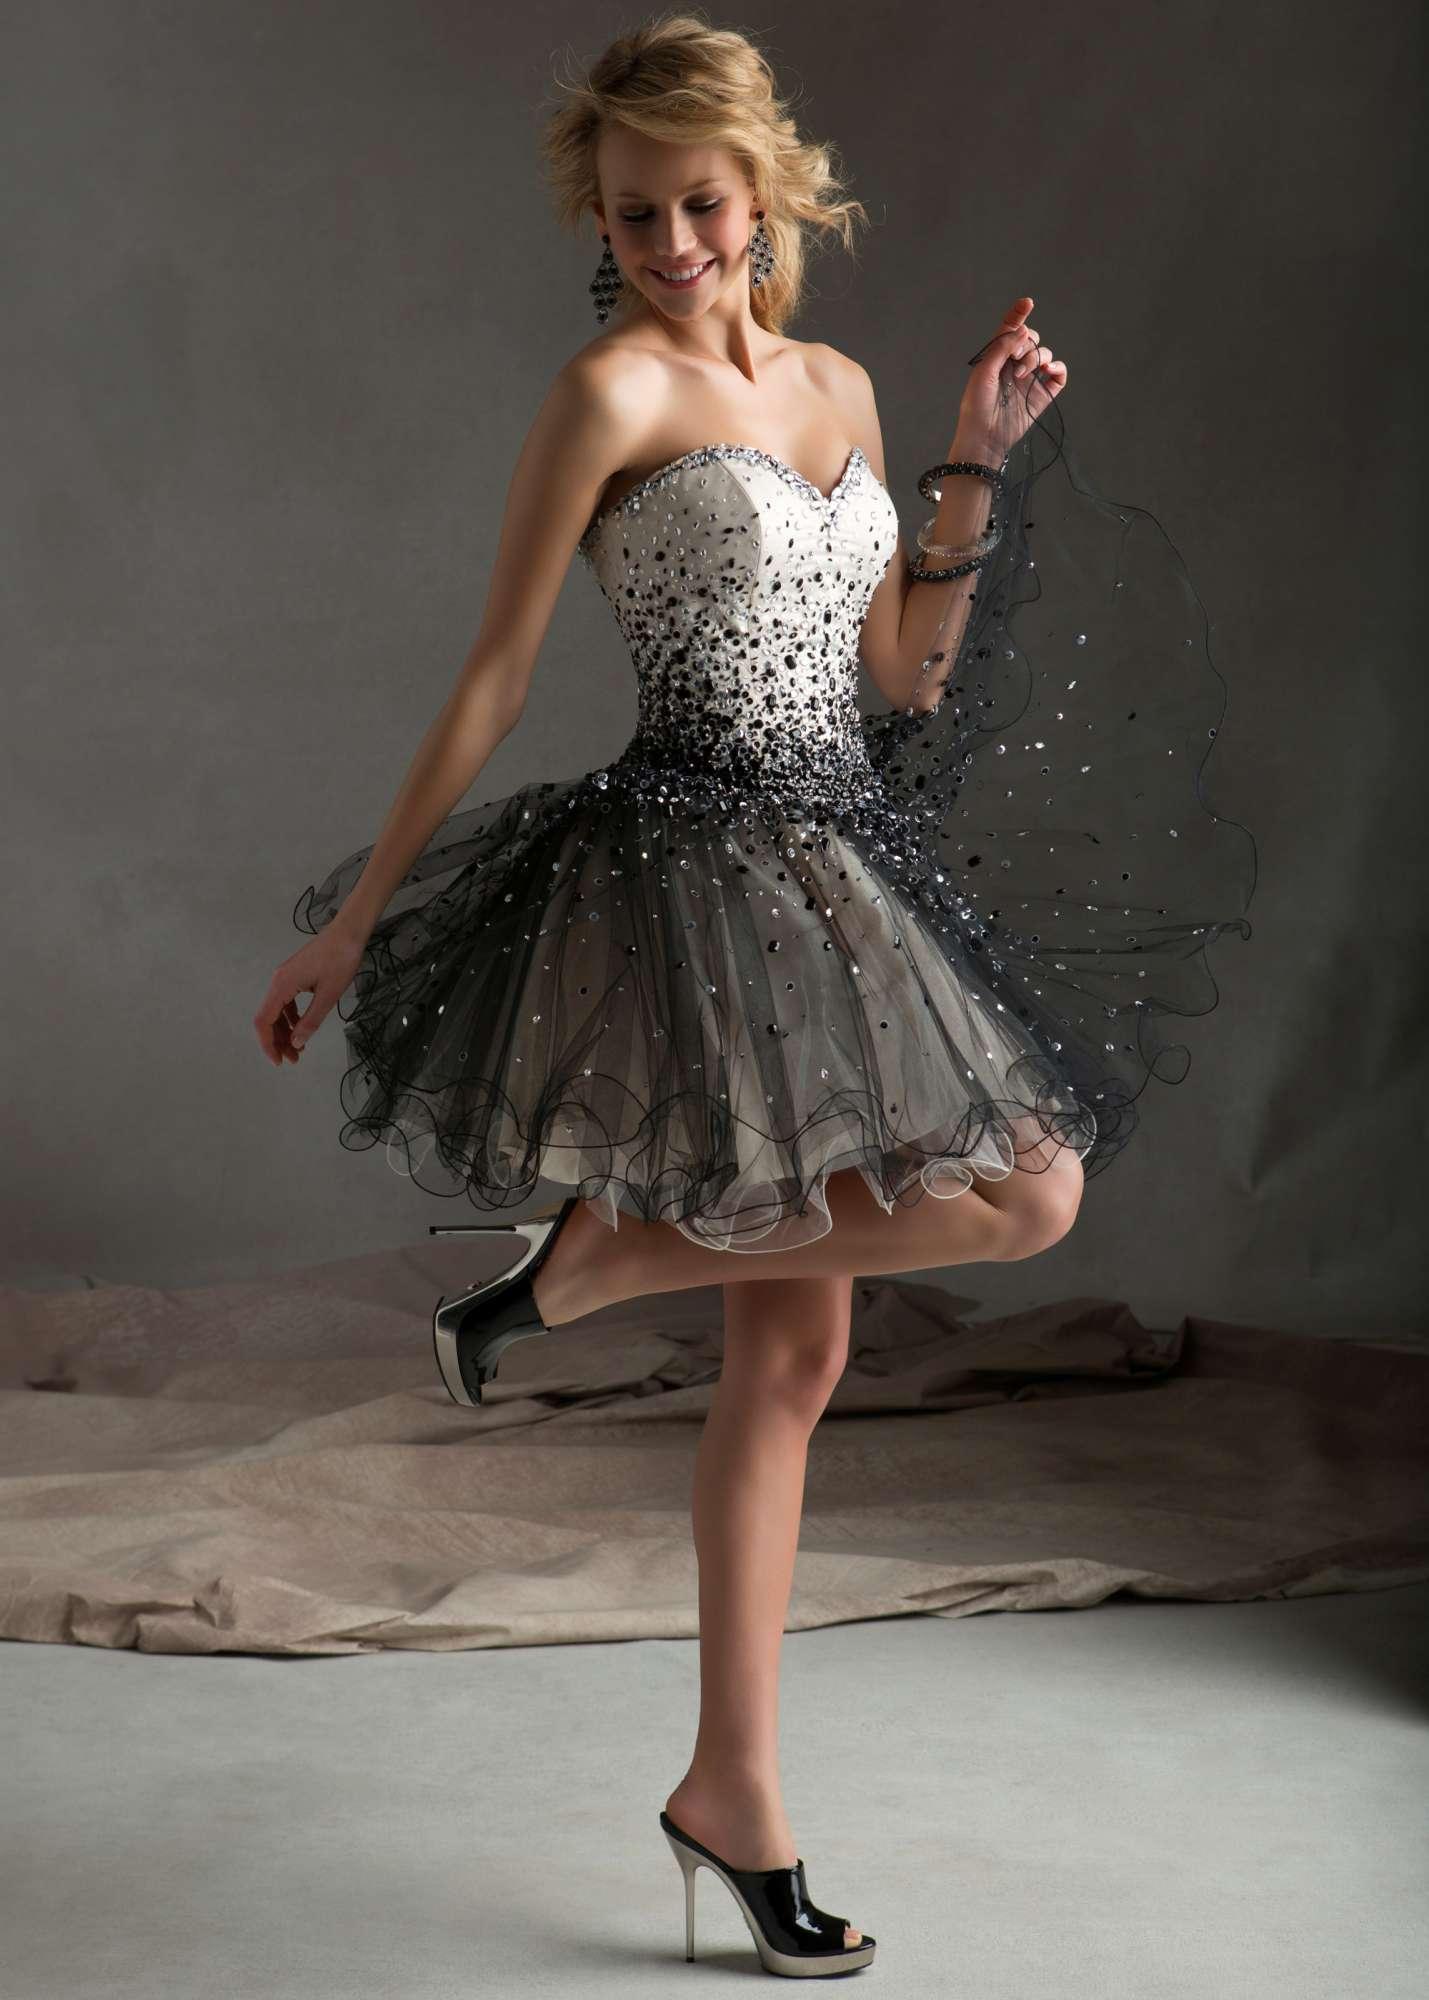 Mori Lee 9233 - Champagne/Black Strapless Beaded Dress - RissyRoos.com